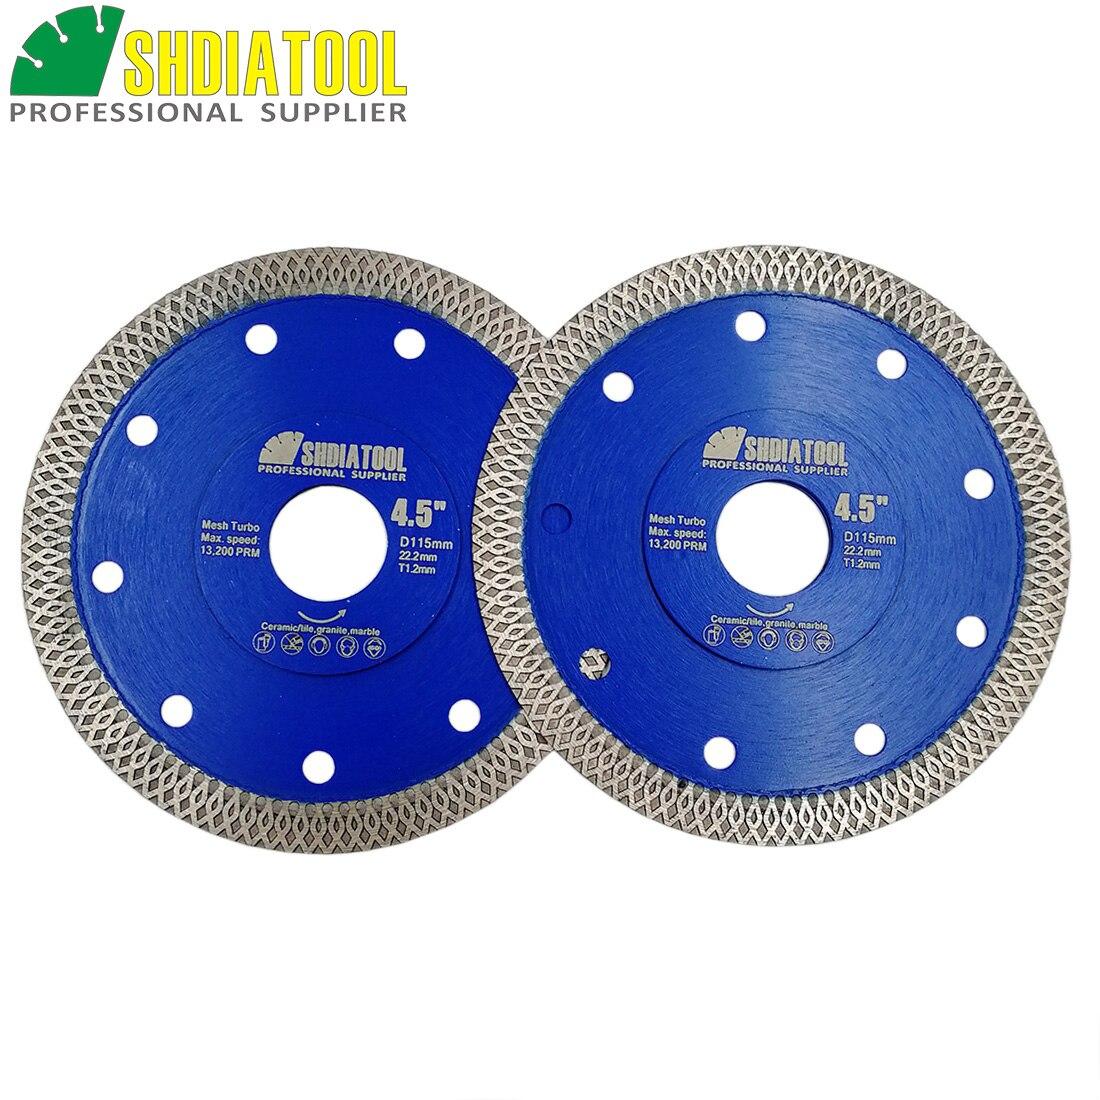 SHDIATOOL 2units Dia 4.5inch/115mm Hot pressed X Mesh Turbo Diamond Saw blade Diamond height 10MM Cutting Disc for Ceramic Tile